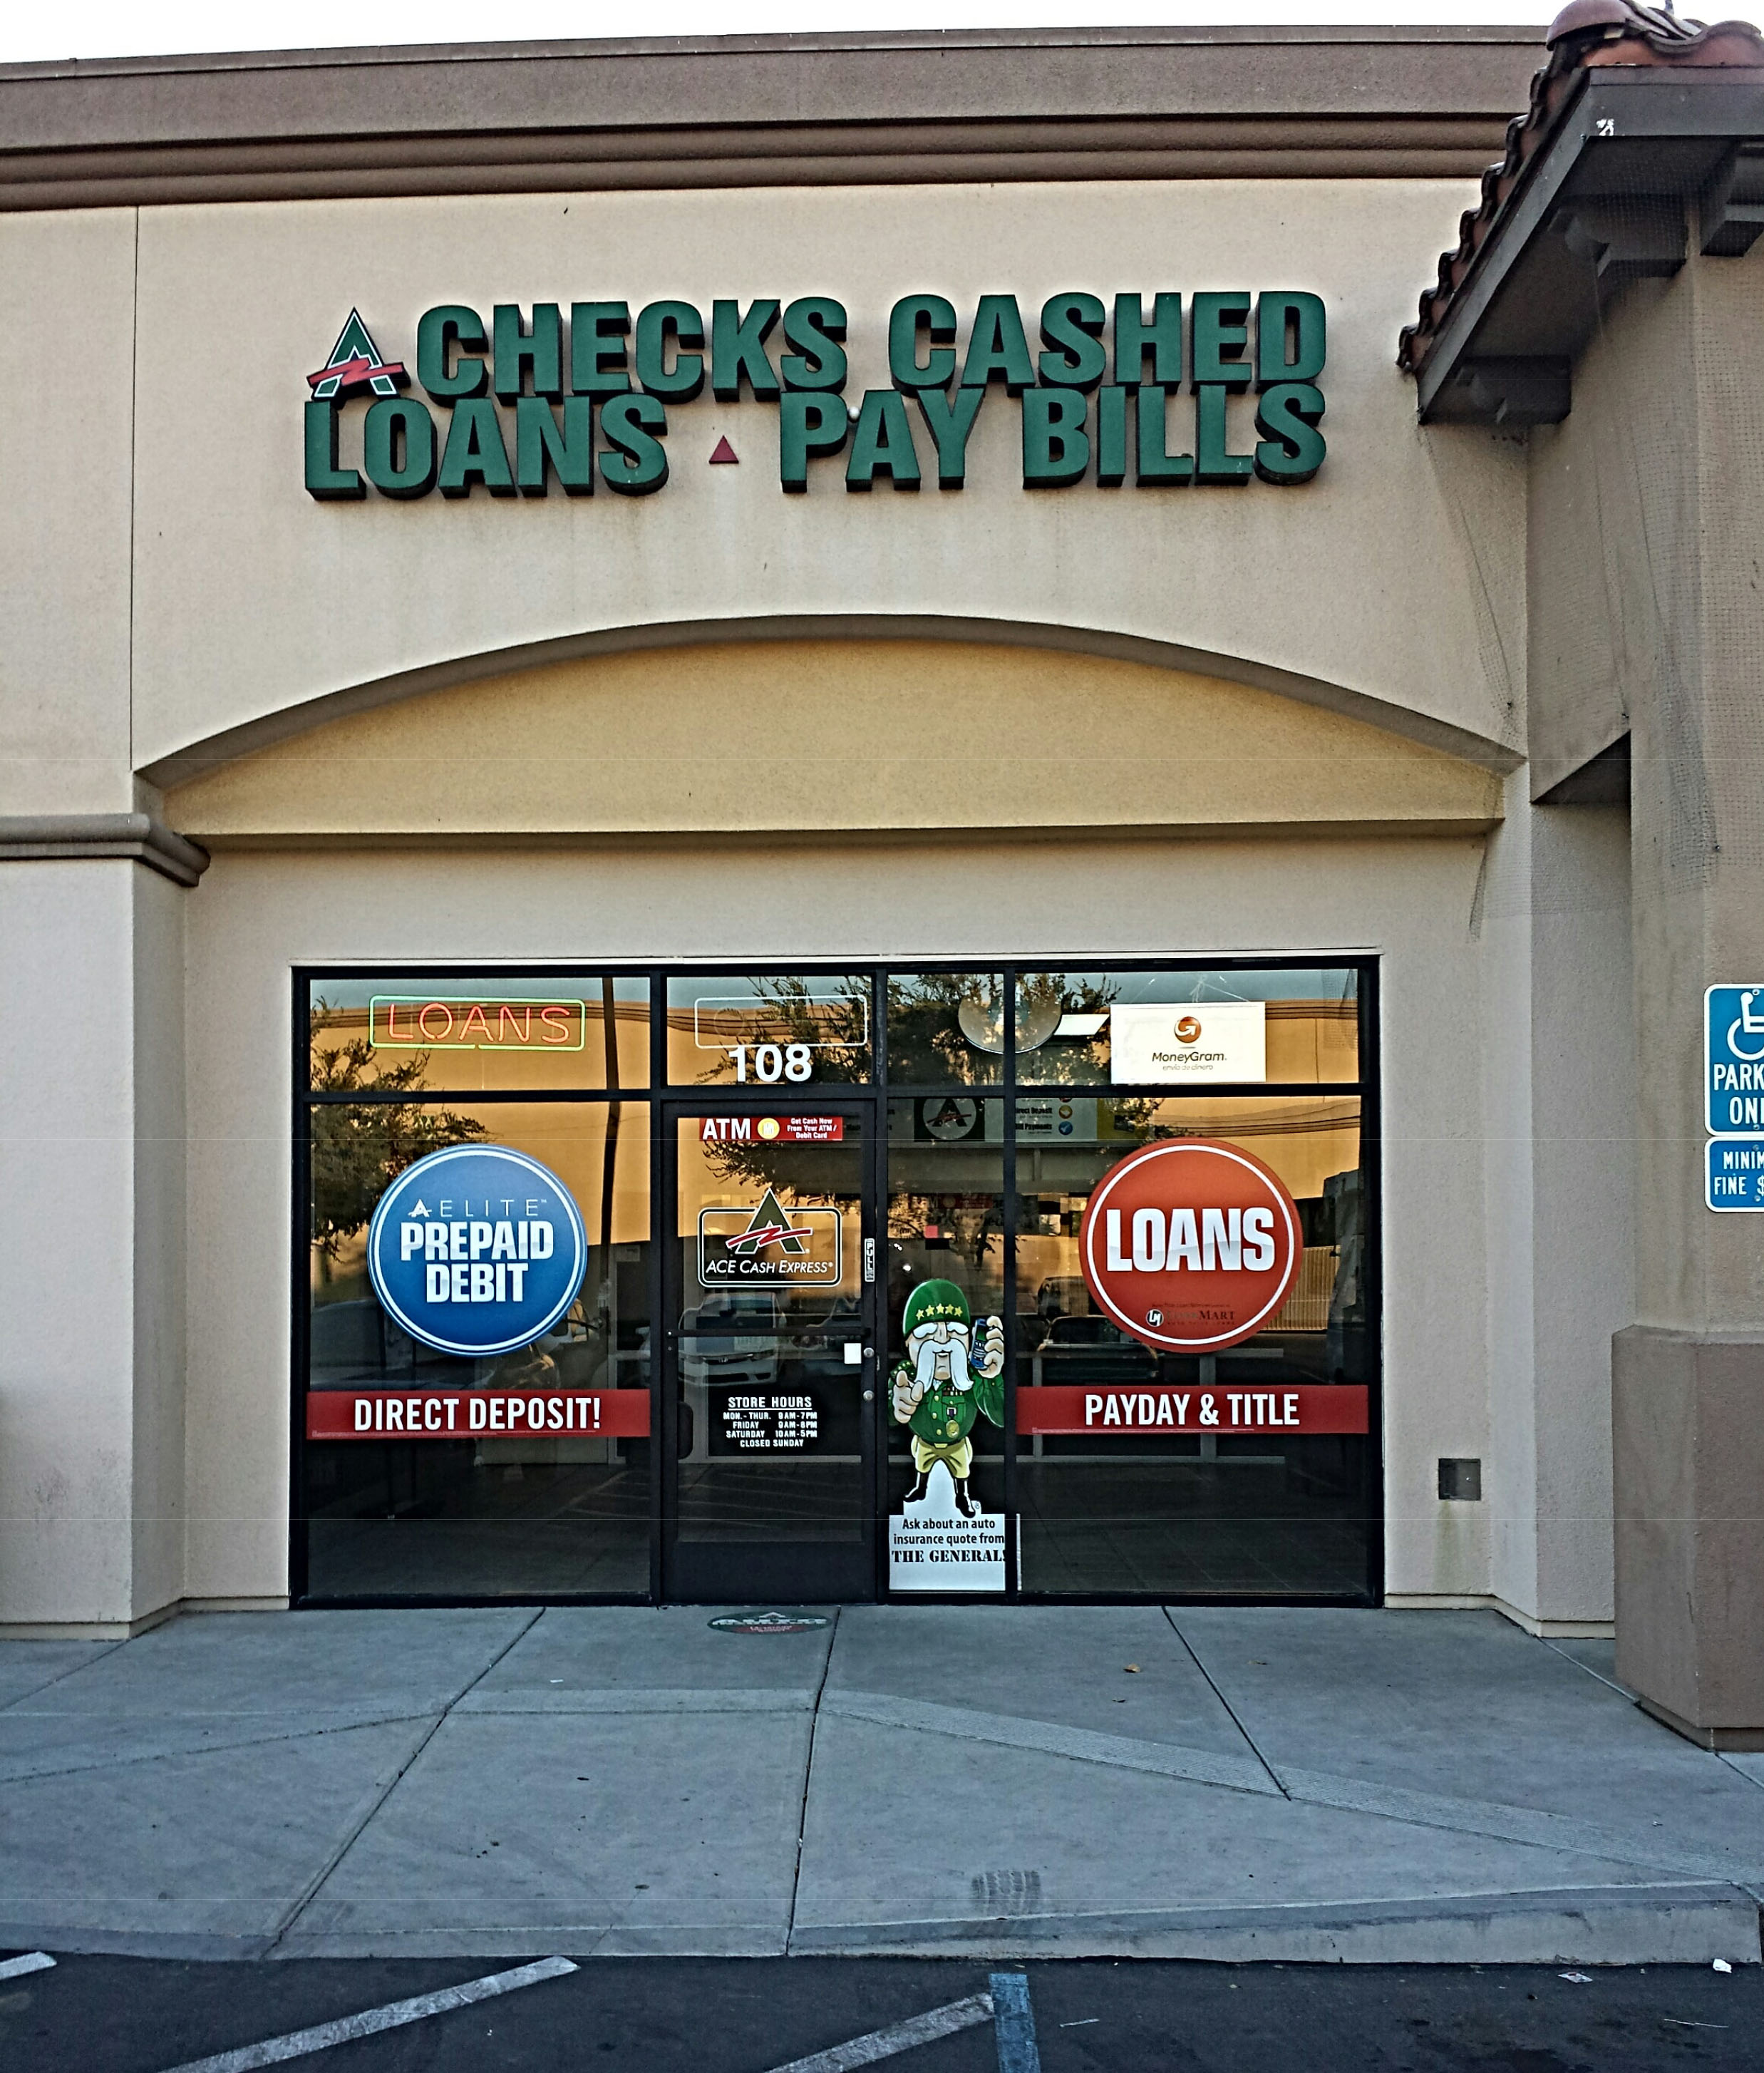 Safe payday loans bad credit photo 1